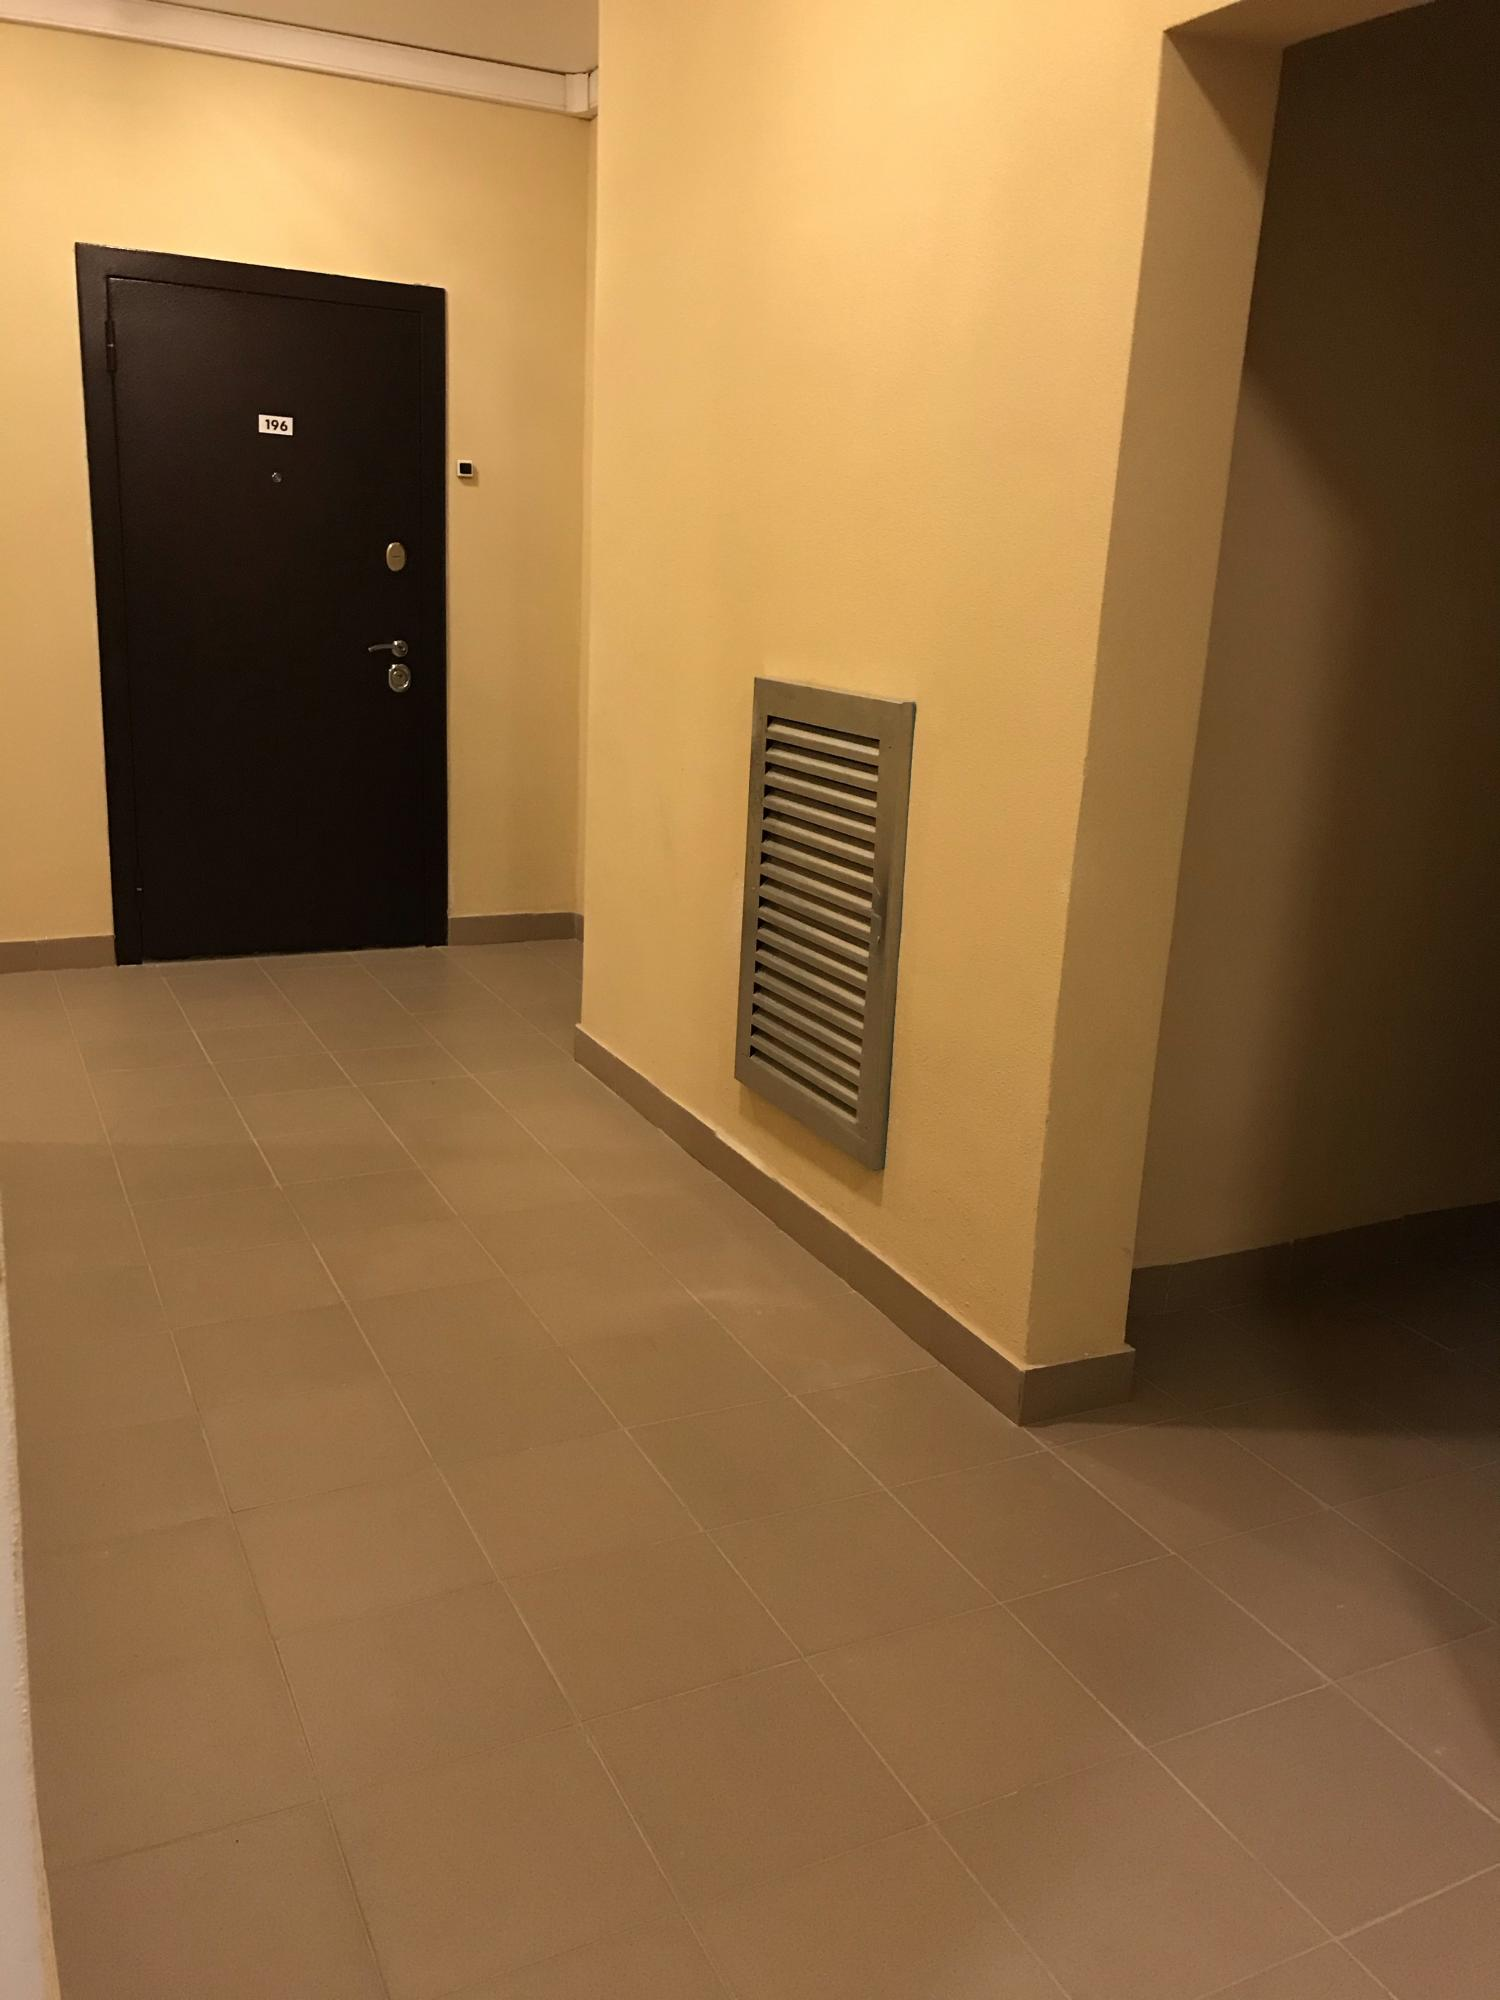 Квартира, 1 комната, 35 м² 89258601492 купить 4